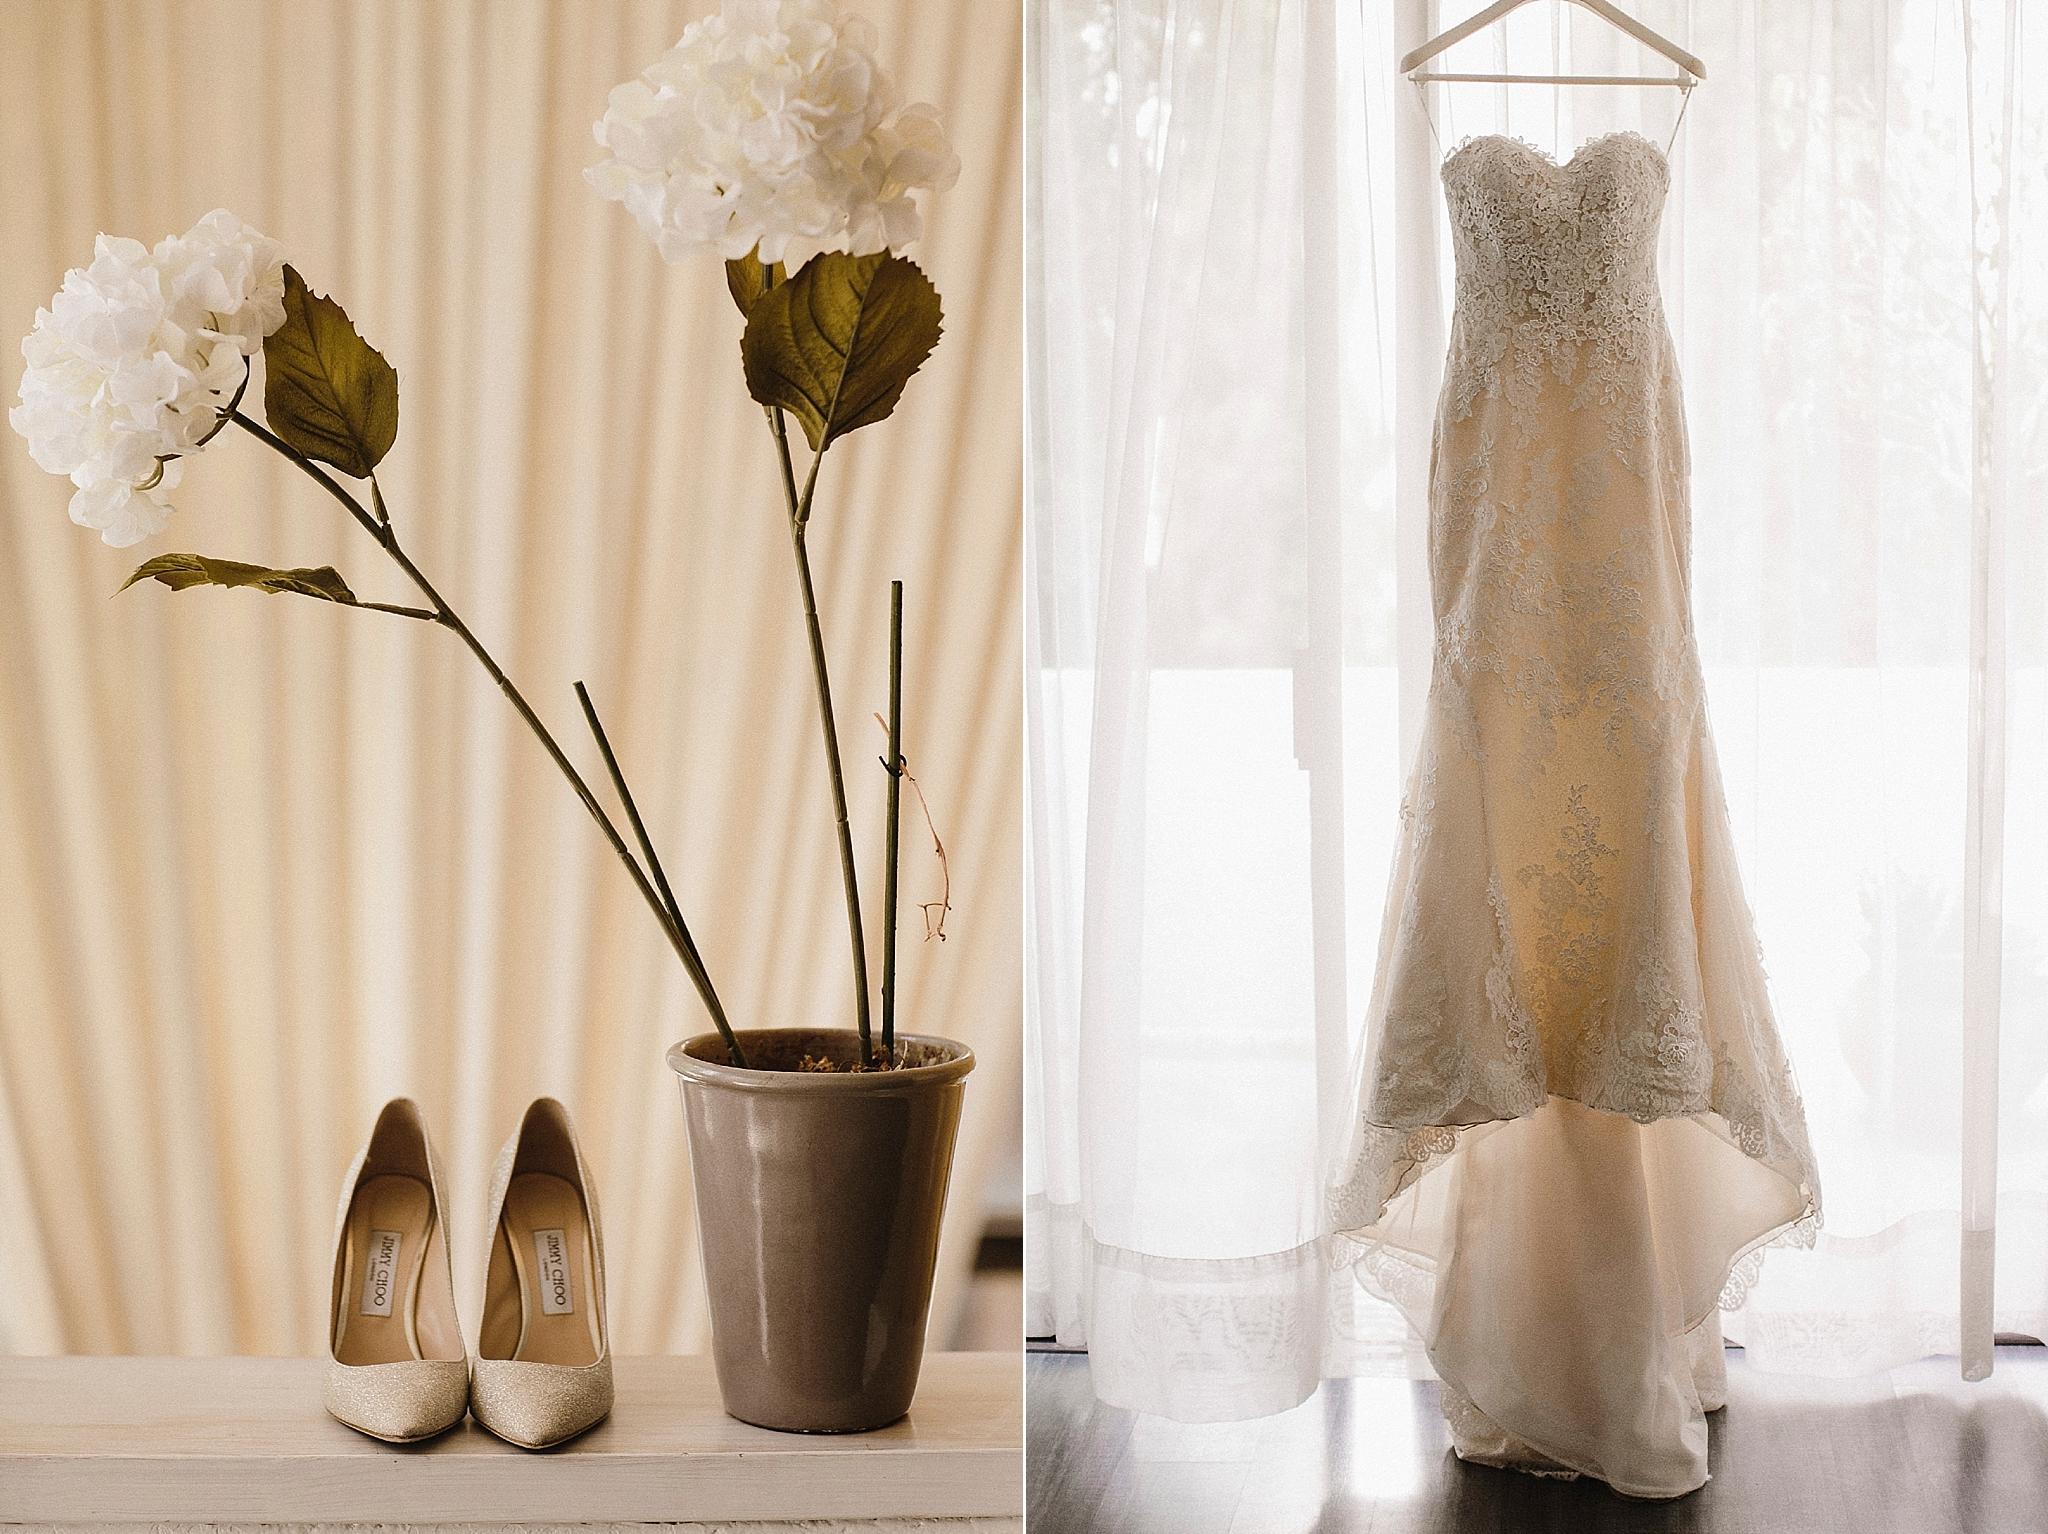 alfonso_flores_destination_wedding_photogrpahy_paola_alonso-13.jpg